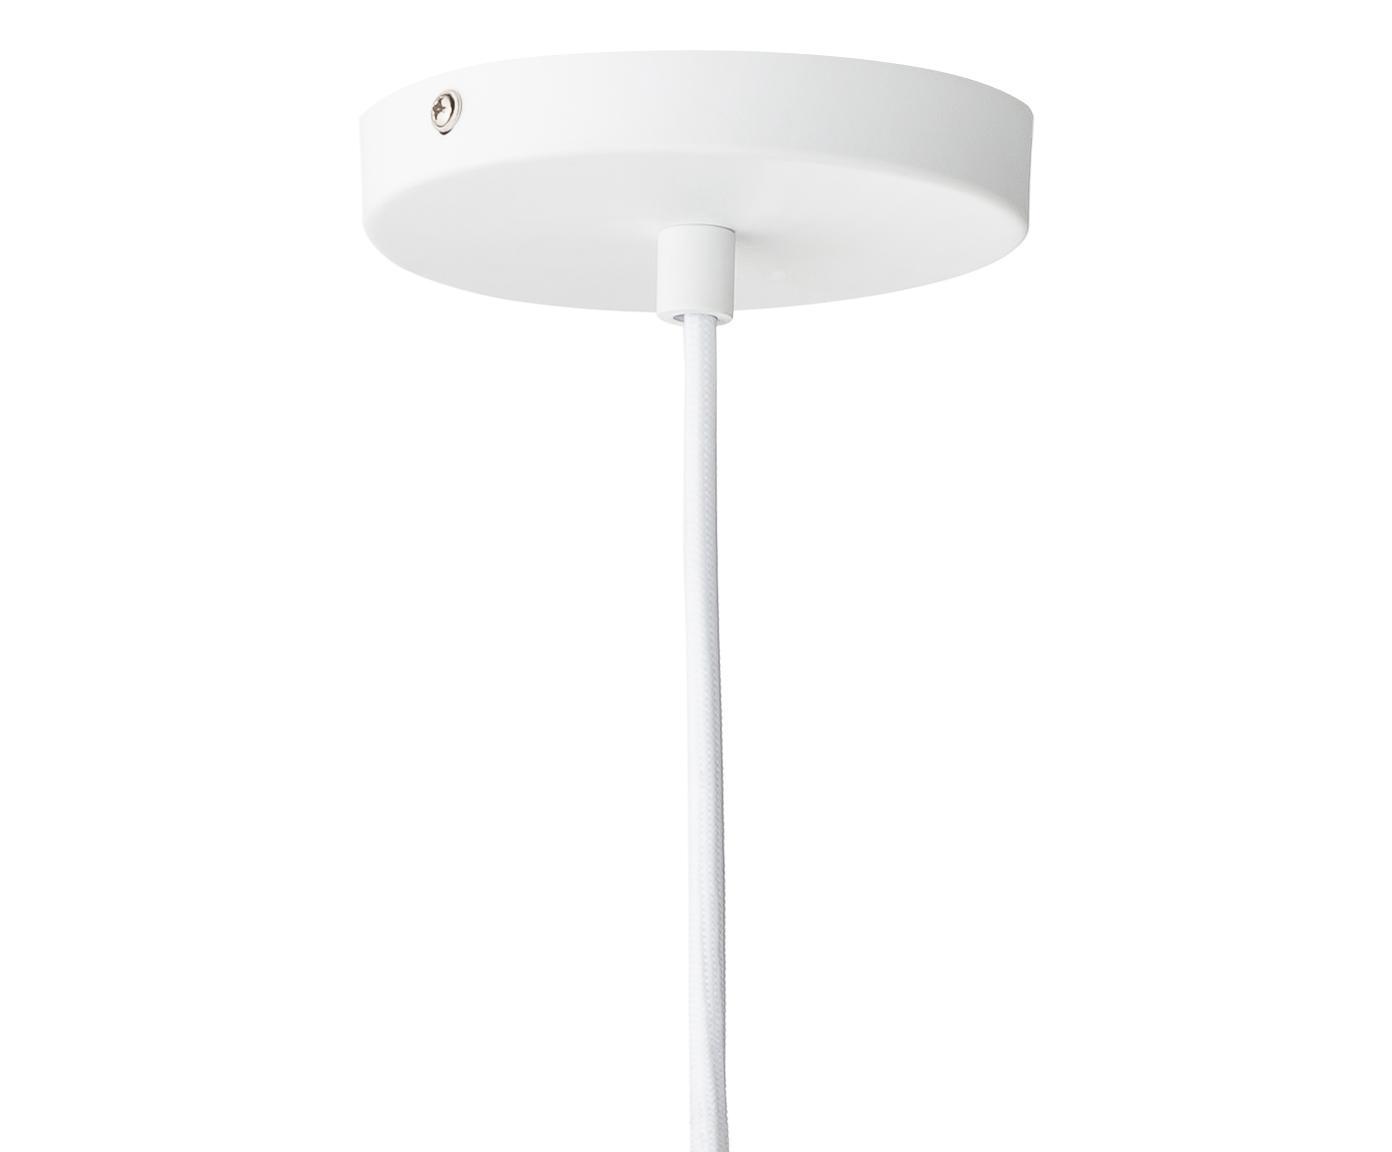 Marmeren hanglamp Siv, Marmer, kunststof, textiel, Wit, messingkleurig, Ø 6 cm